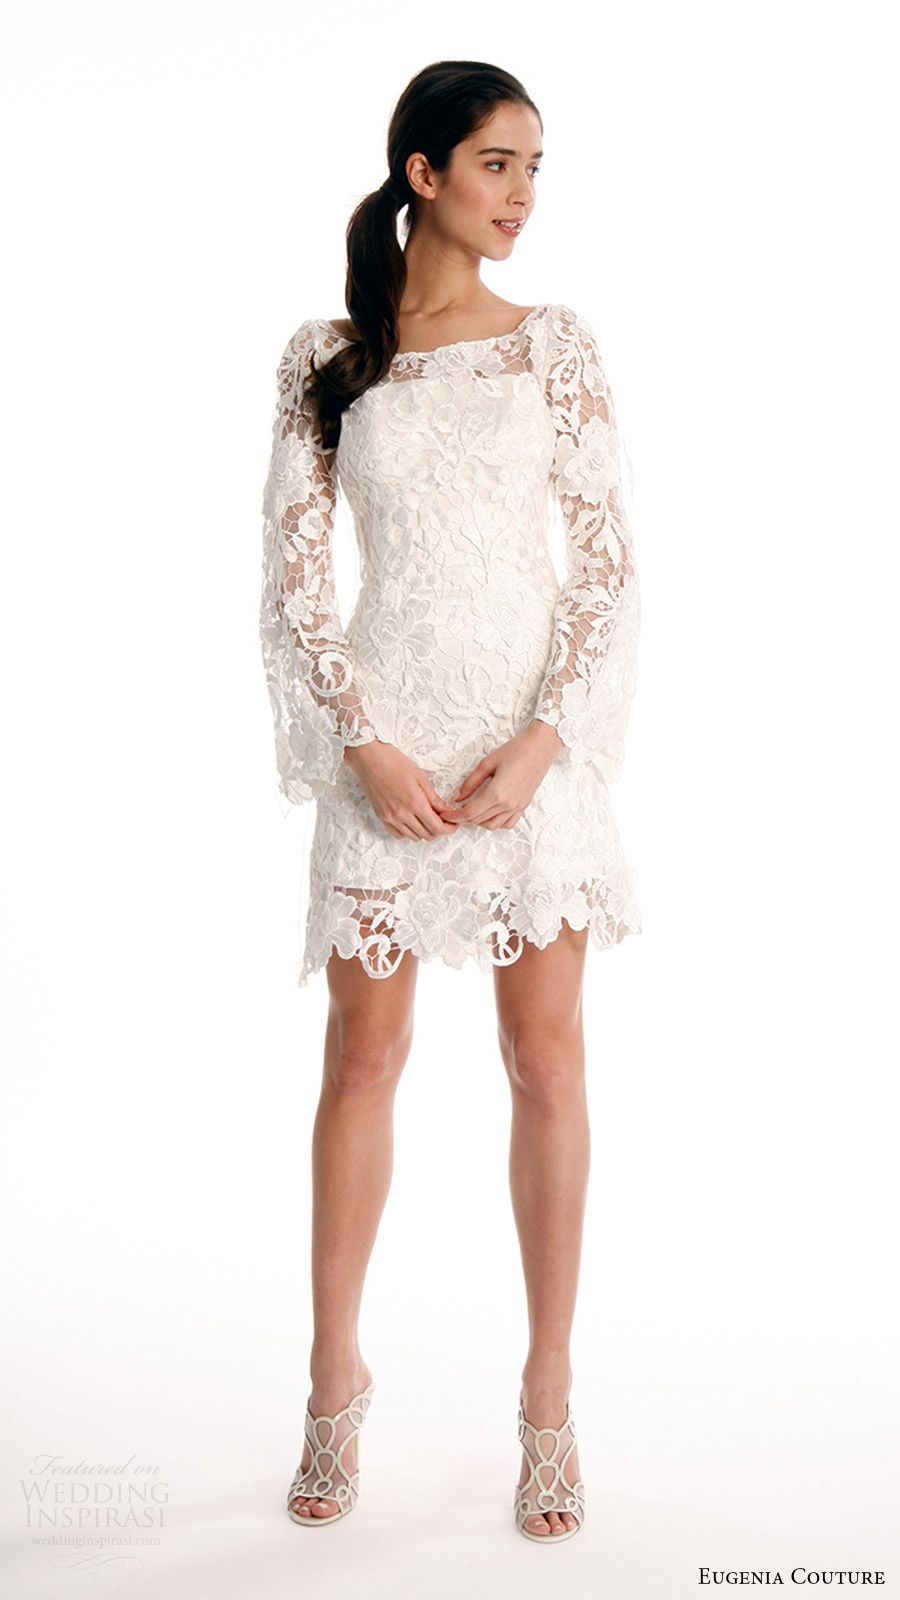 Eugenia Couture Spring 2017 Wedding Dresses Joy Bridal Collection Wedding Inspirasi Tea Length Wedding Dress Casual Wedding Dress Wedding Dresses Lace [ 1600 x 900 Pixel ]